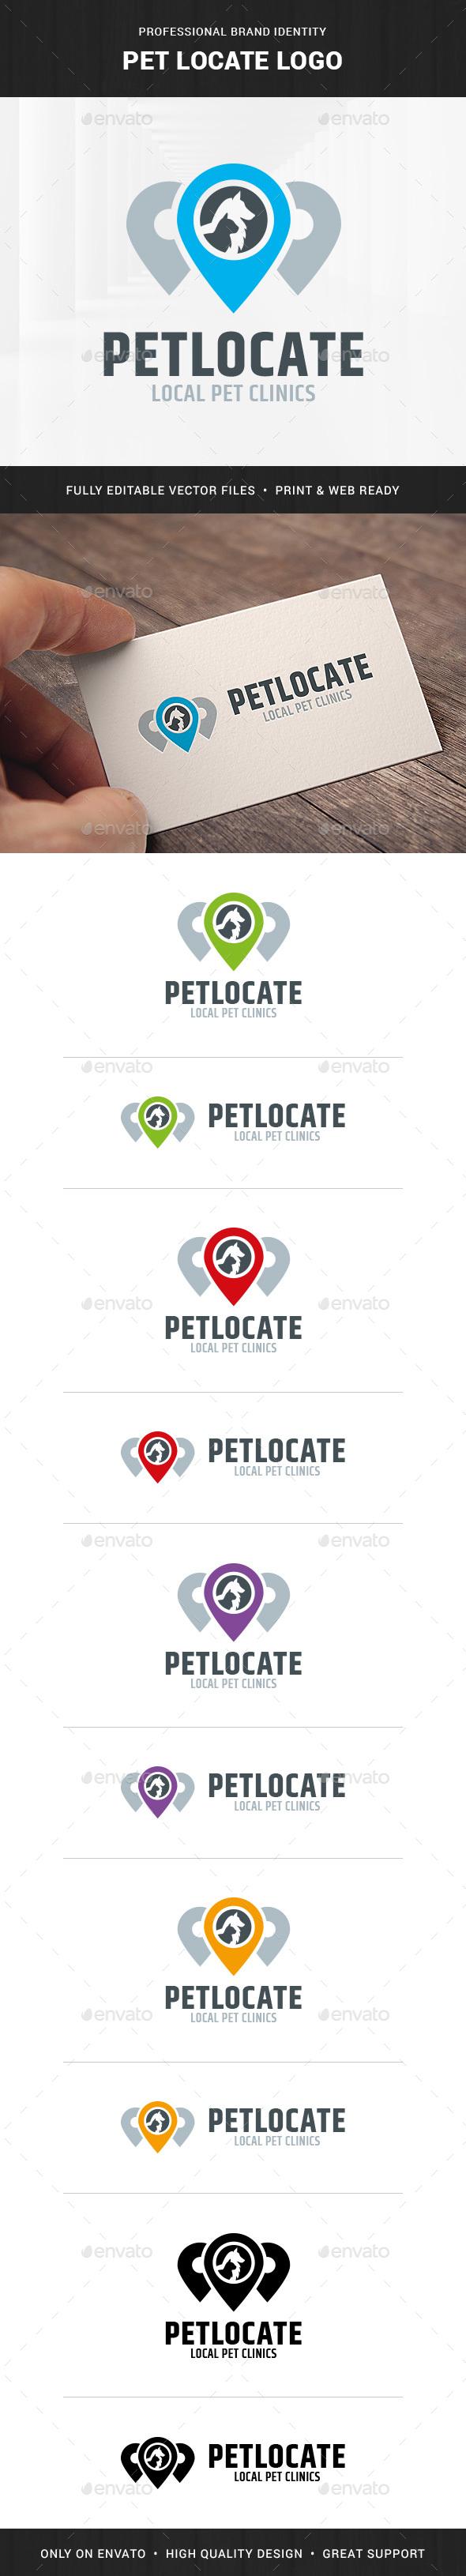 Pet Locate Logo Template - Animals Logo Templates